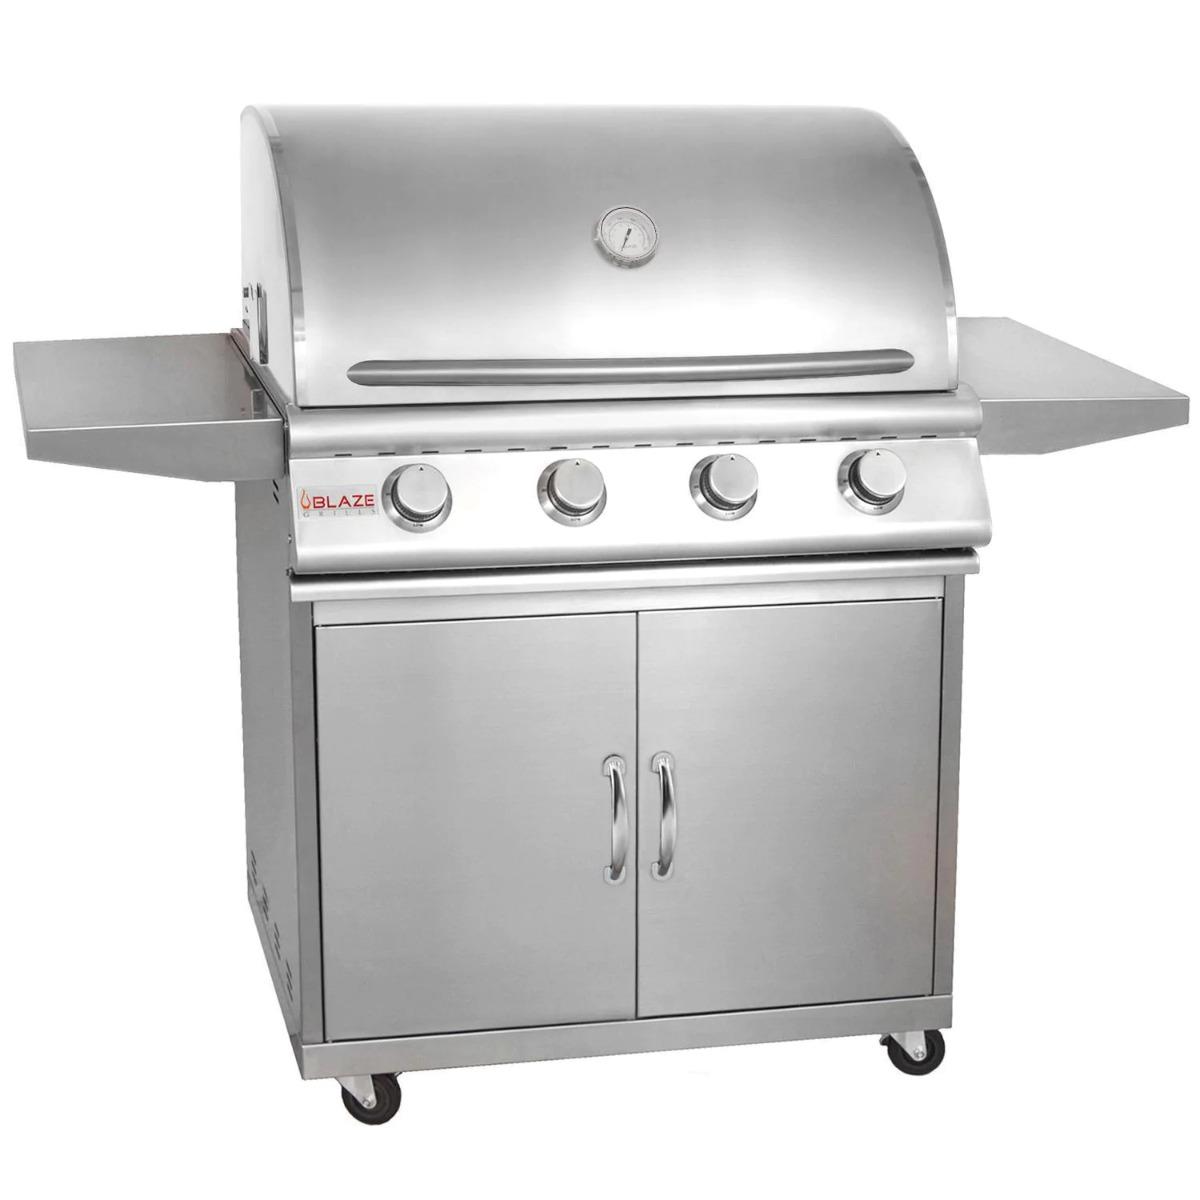 4 Burner LBM Freestanding Natural Gas Blaze Grill (32 Inches) blz-4-lbm-ng-rt+blz-4-cart